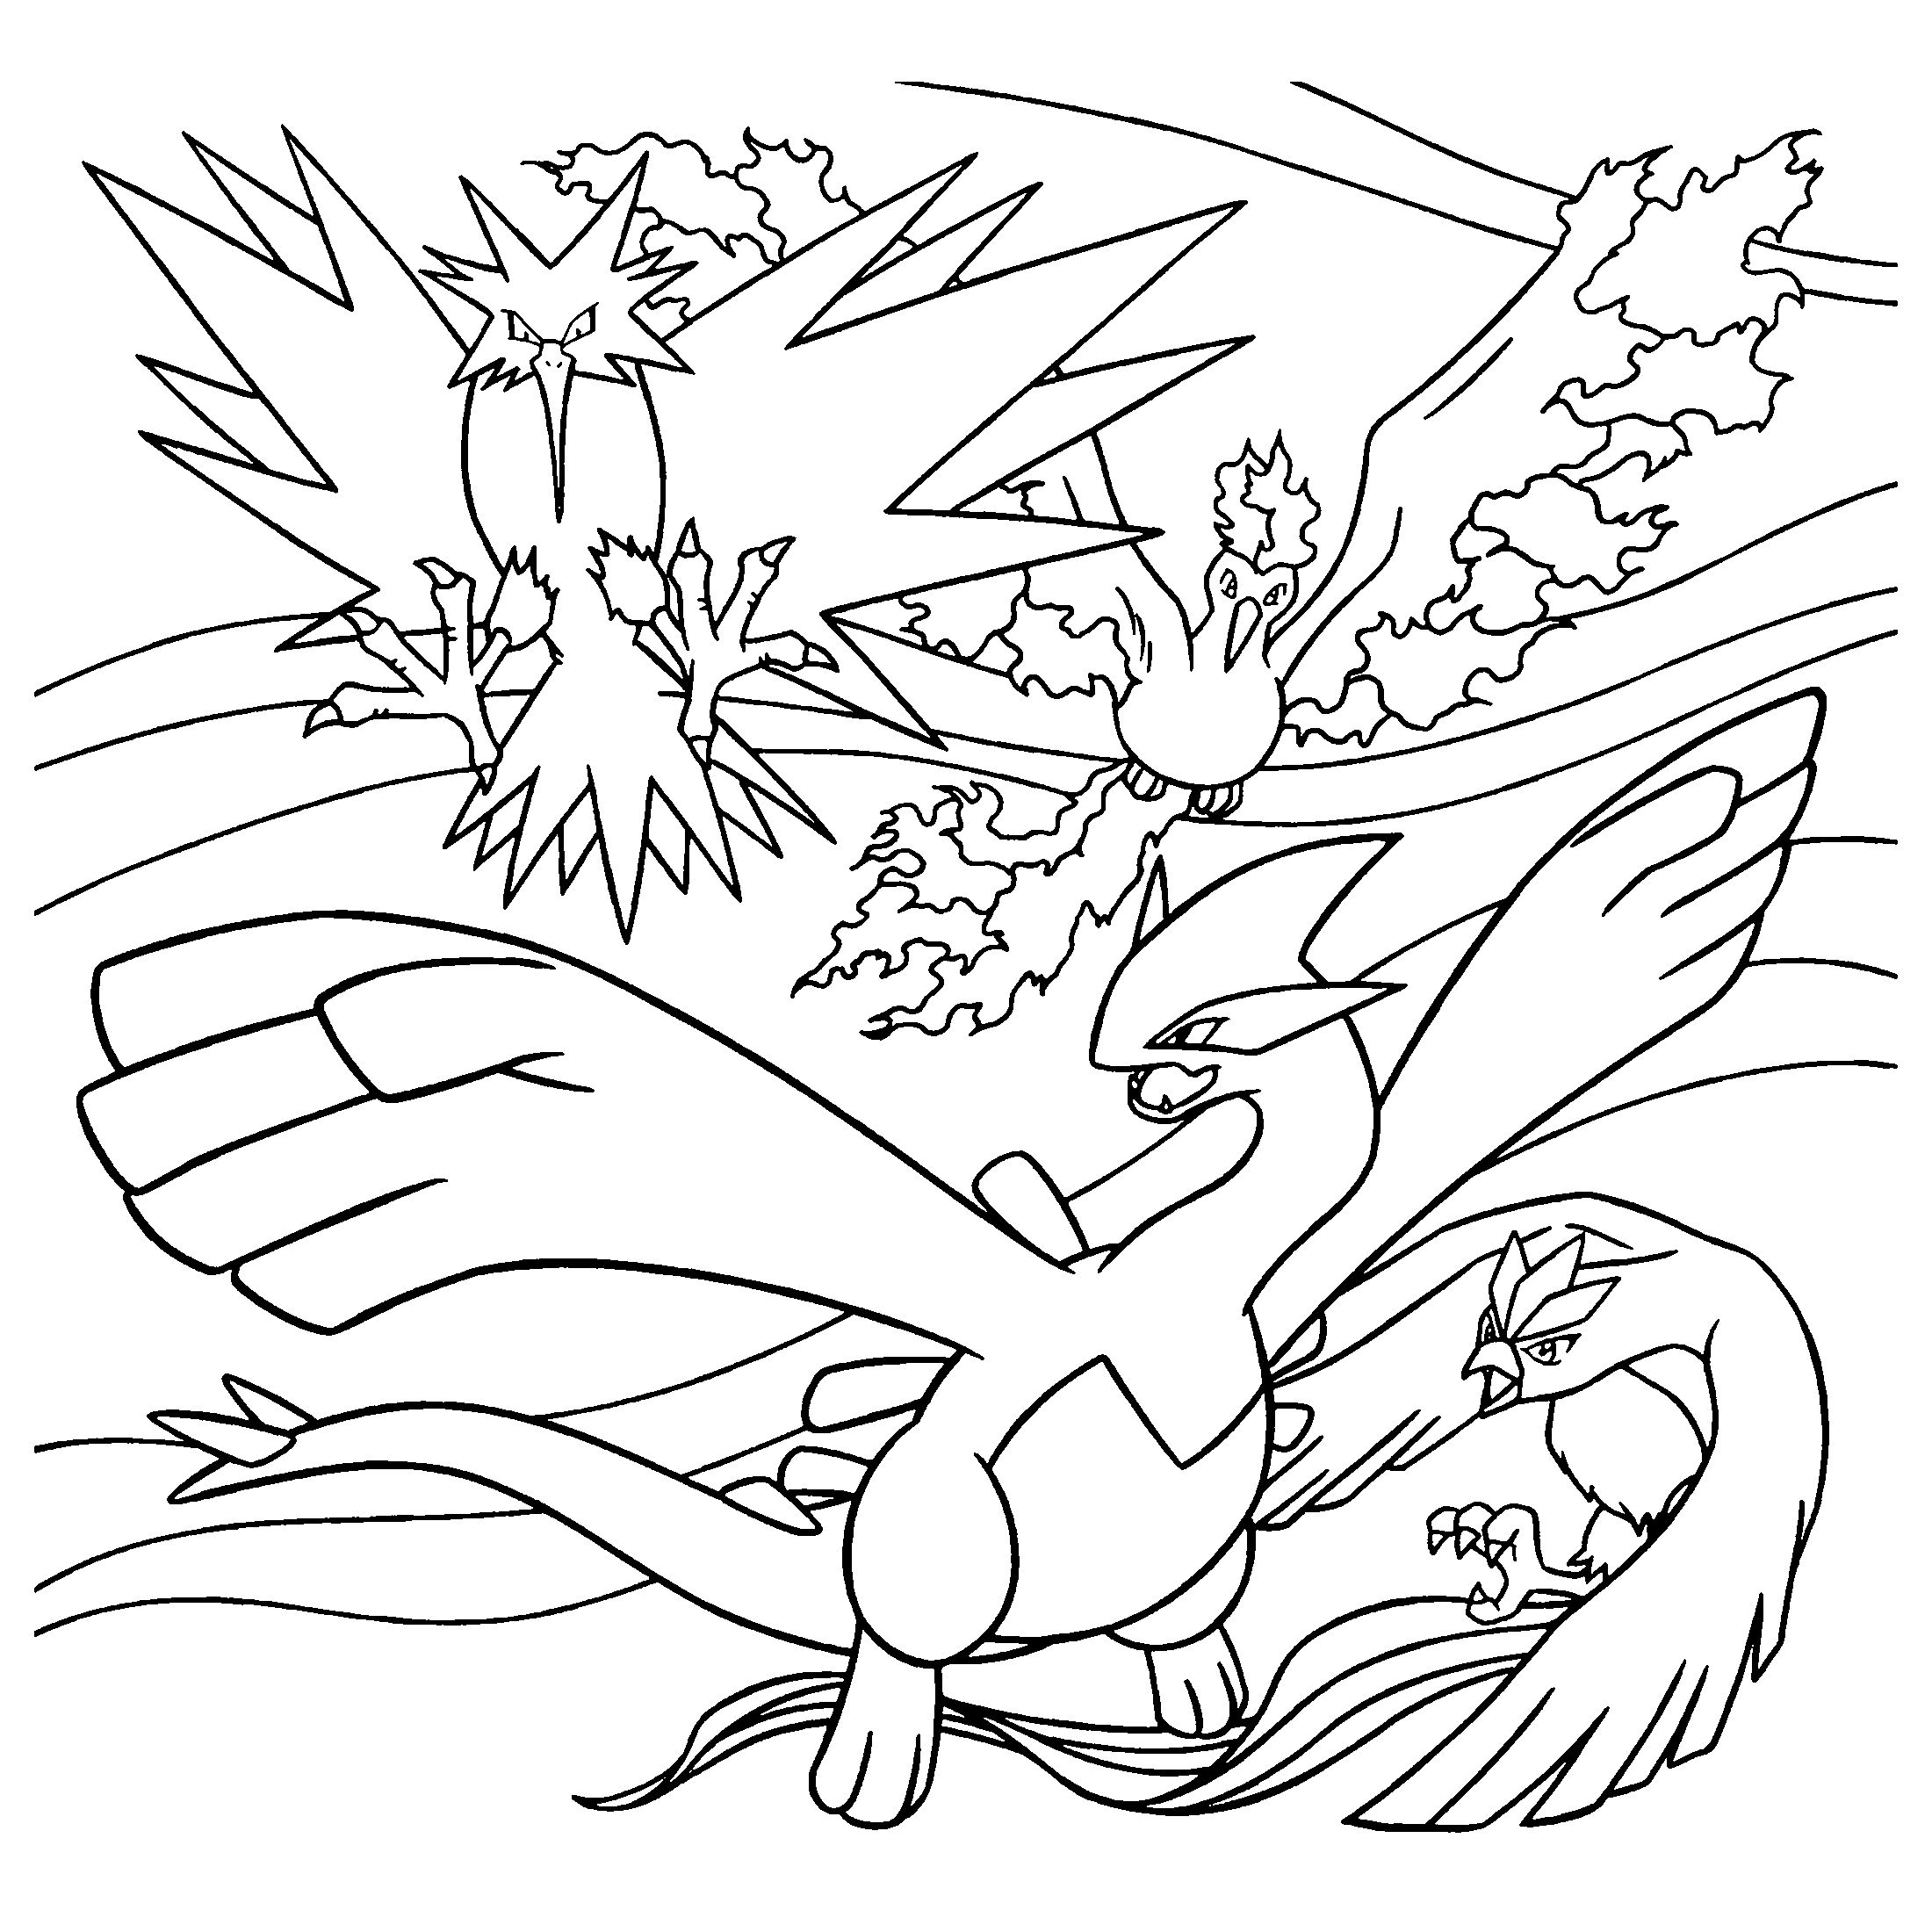 Pokemon Zapdos Coloring Pages Free Zapdos Pokemon Coloring Pages Pokemon Images